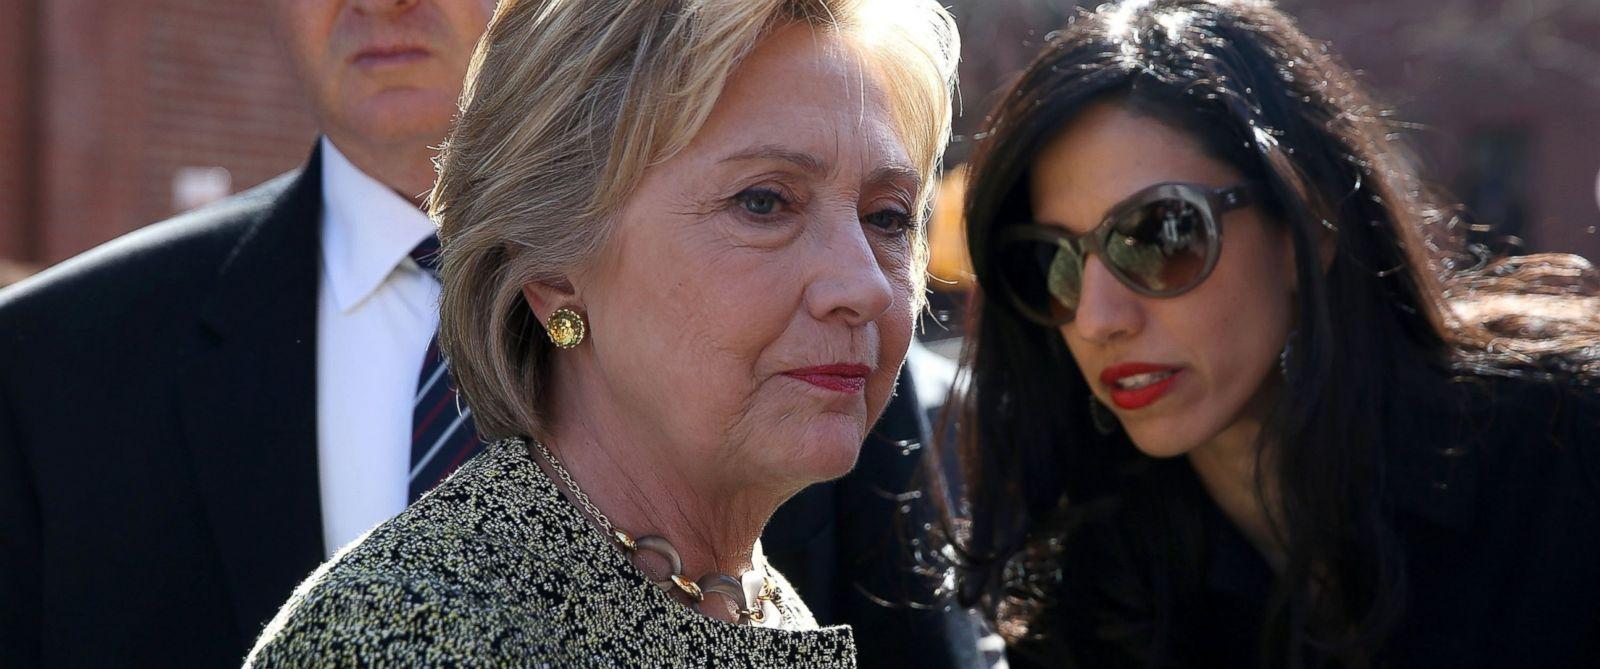 http://a.abcnews.com/images/Politics/GTY_clinton_abedin_jef_160505_12x5_1600.jpg